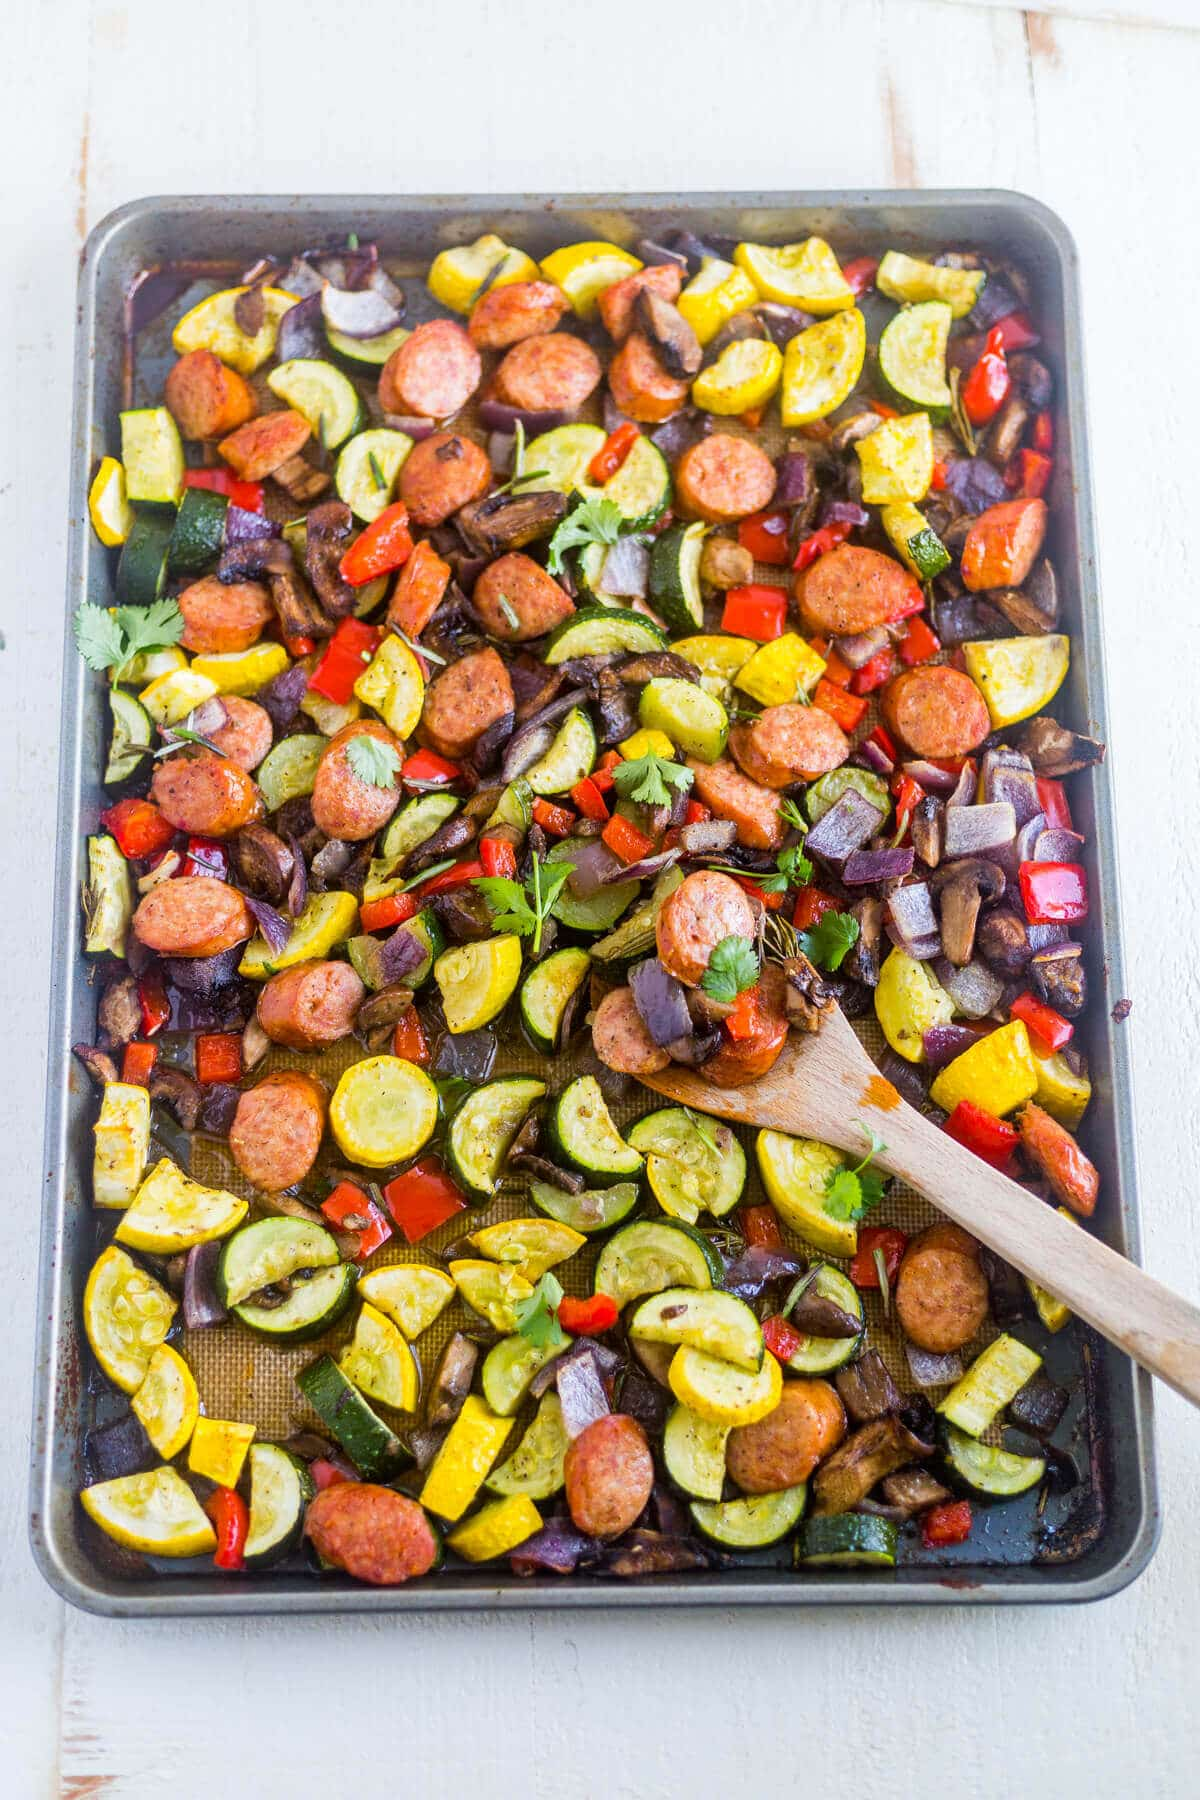 roasted sausage and veggies on a sheet pan